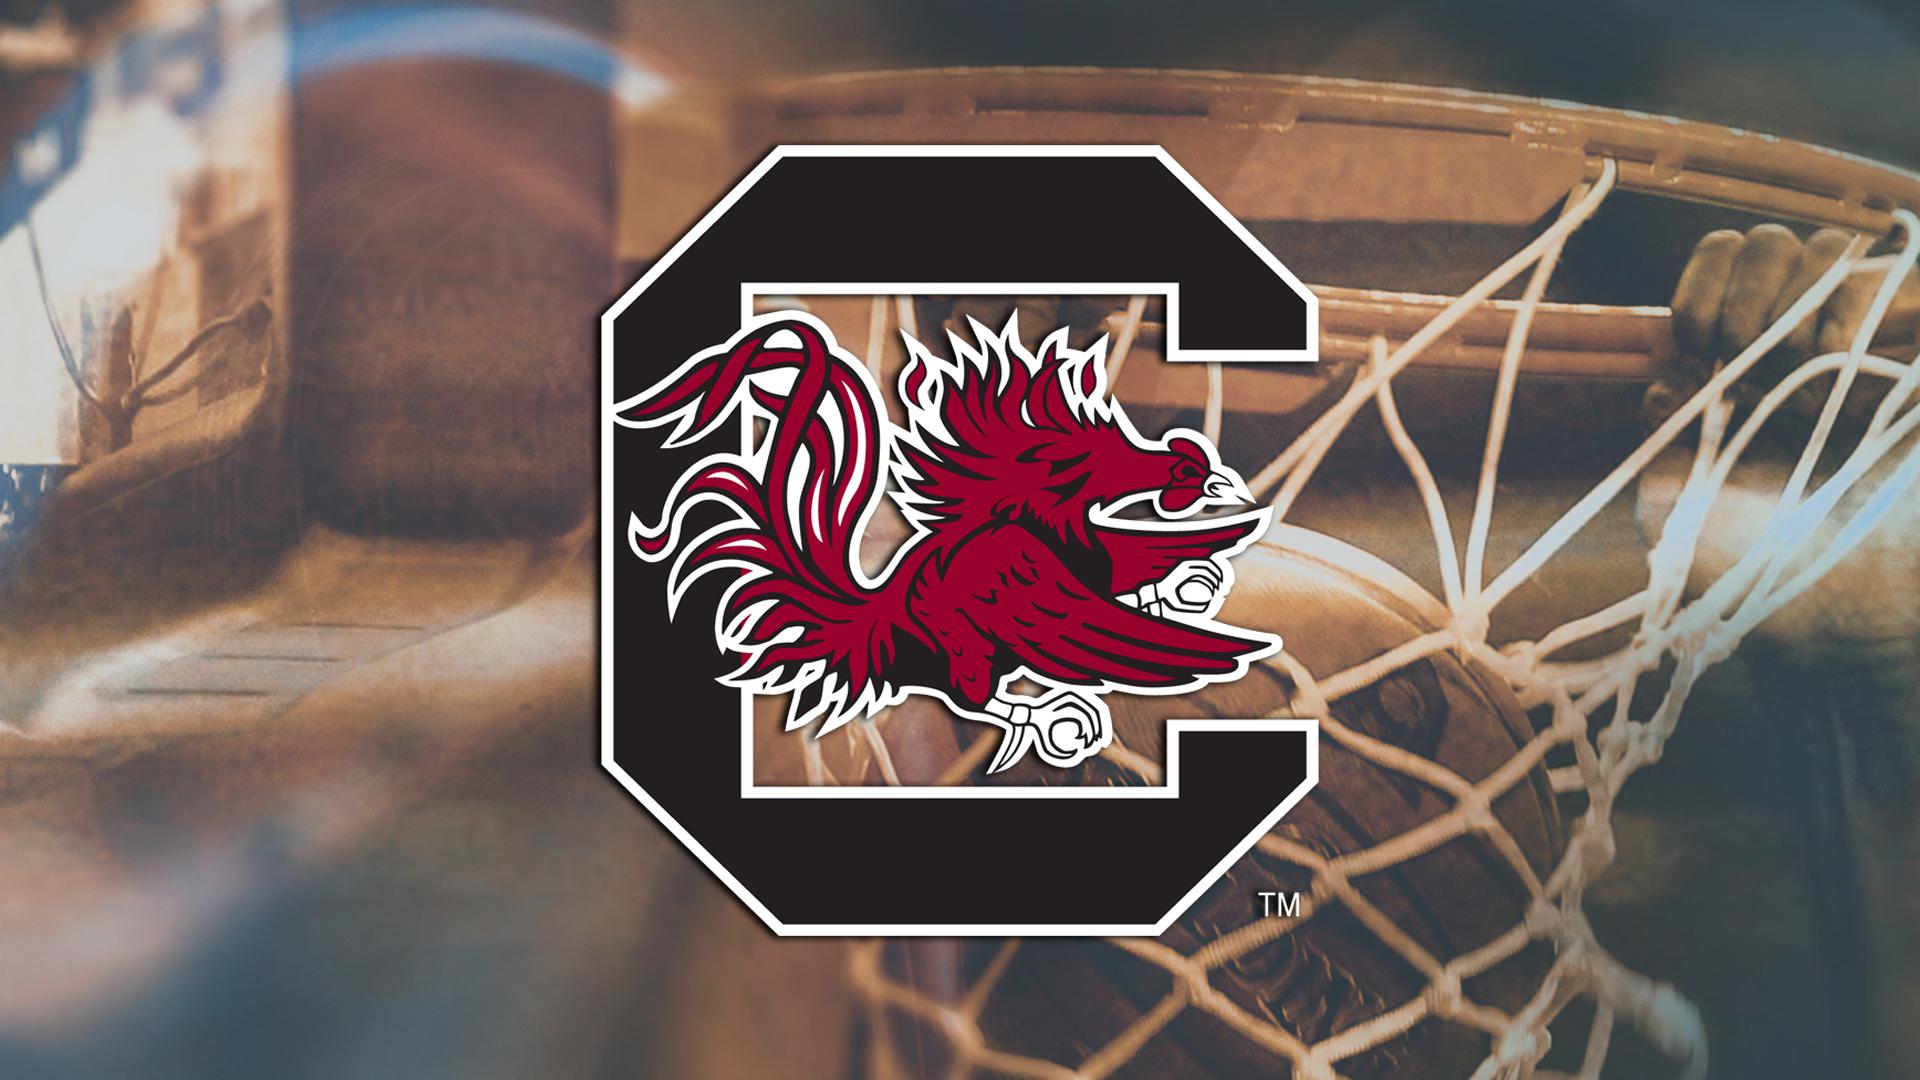 SouthCarolinaGamecocksBasketball_(2)_1547697119217.jpg